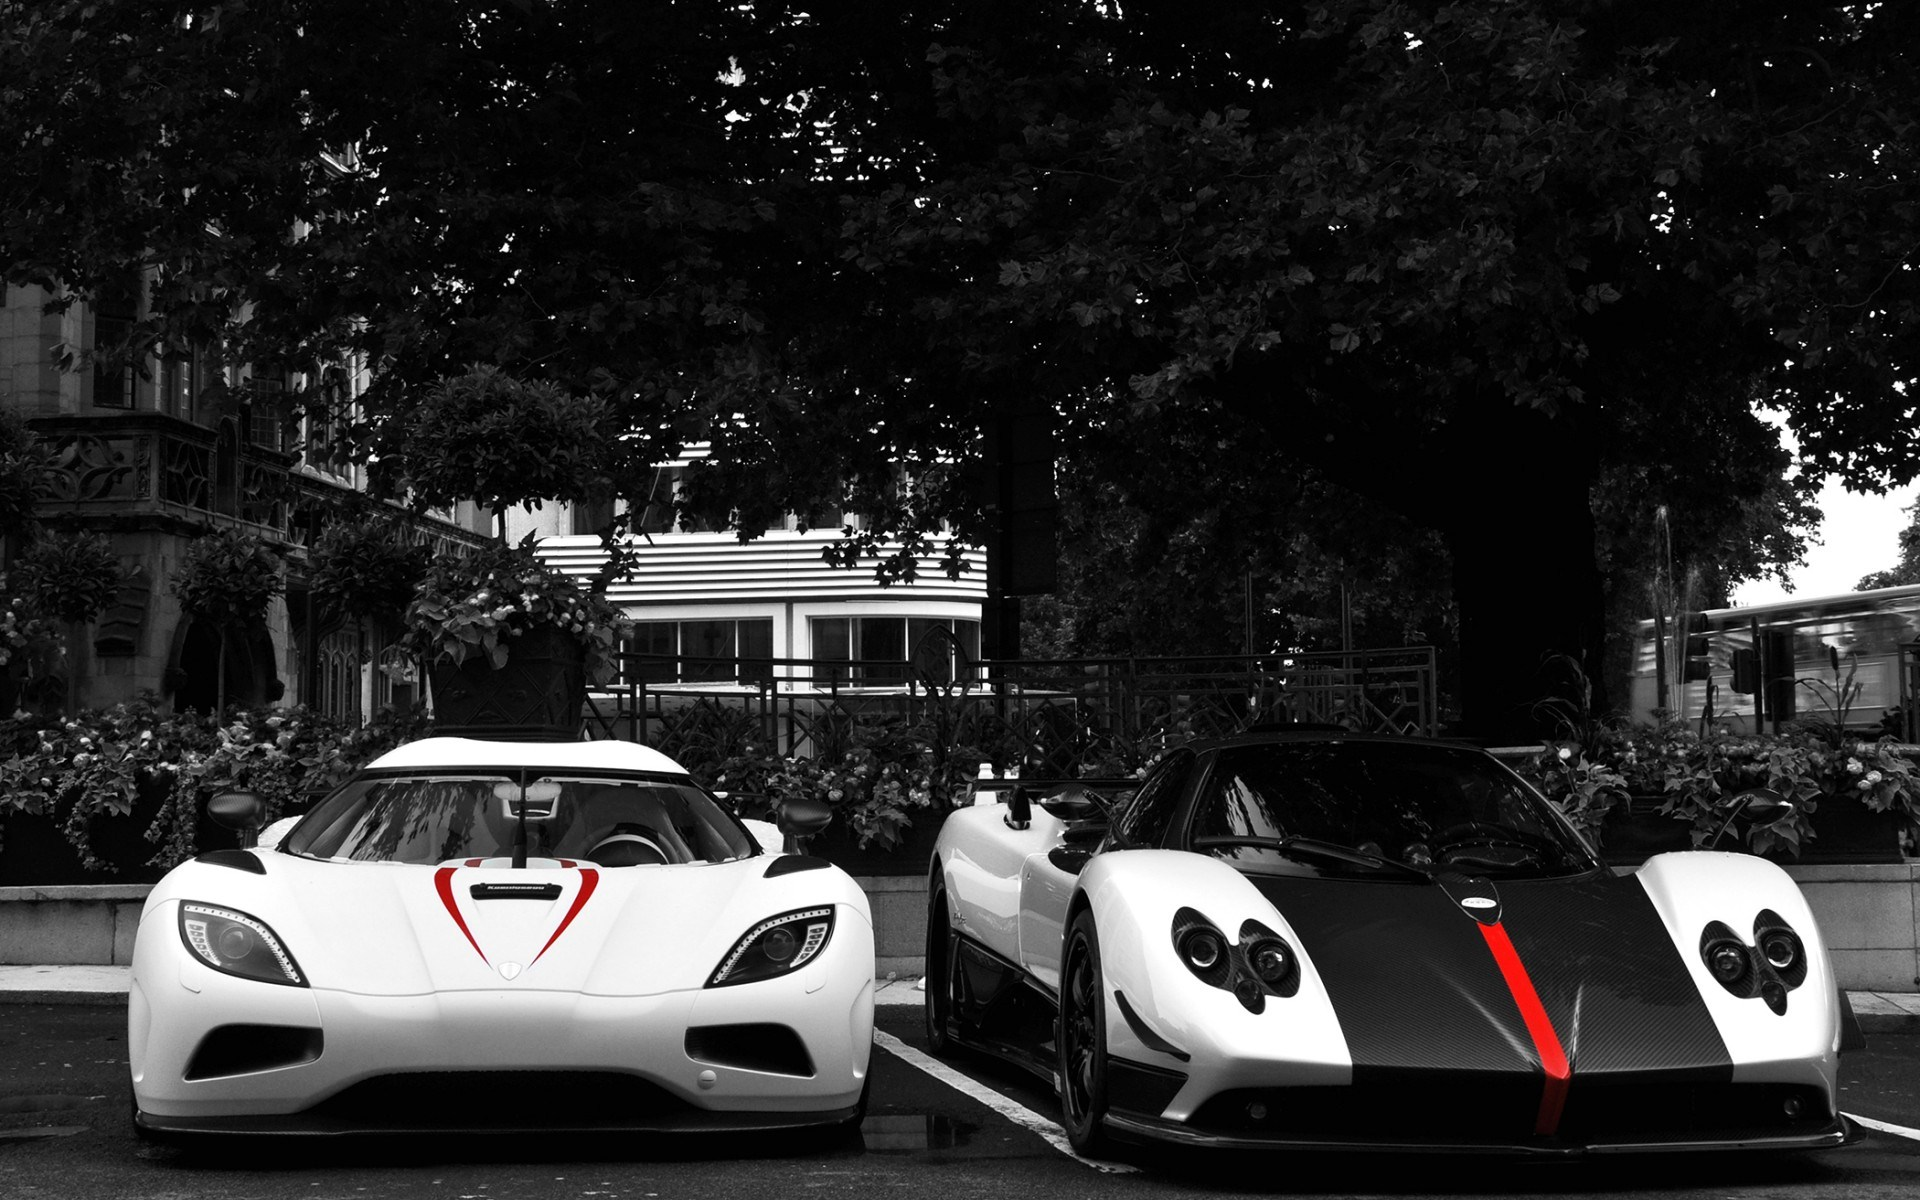 Pagani Zonda Koenigsegg Agera R Luxury Exotic Cars